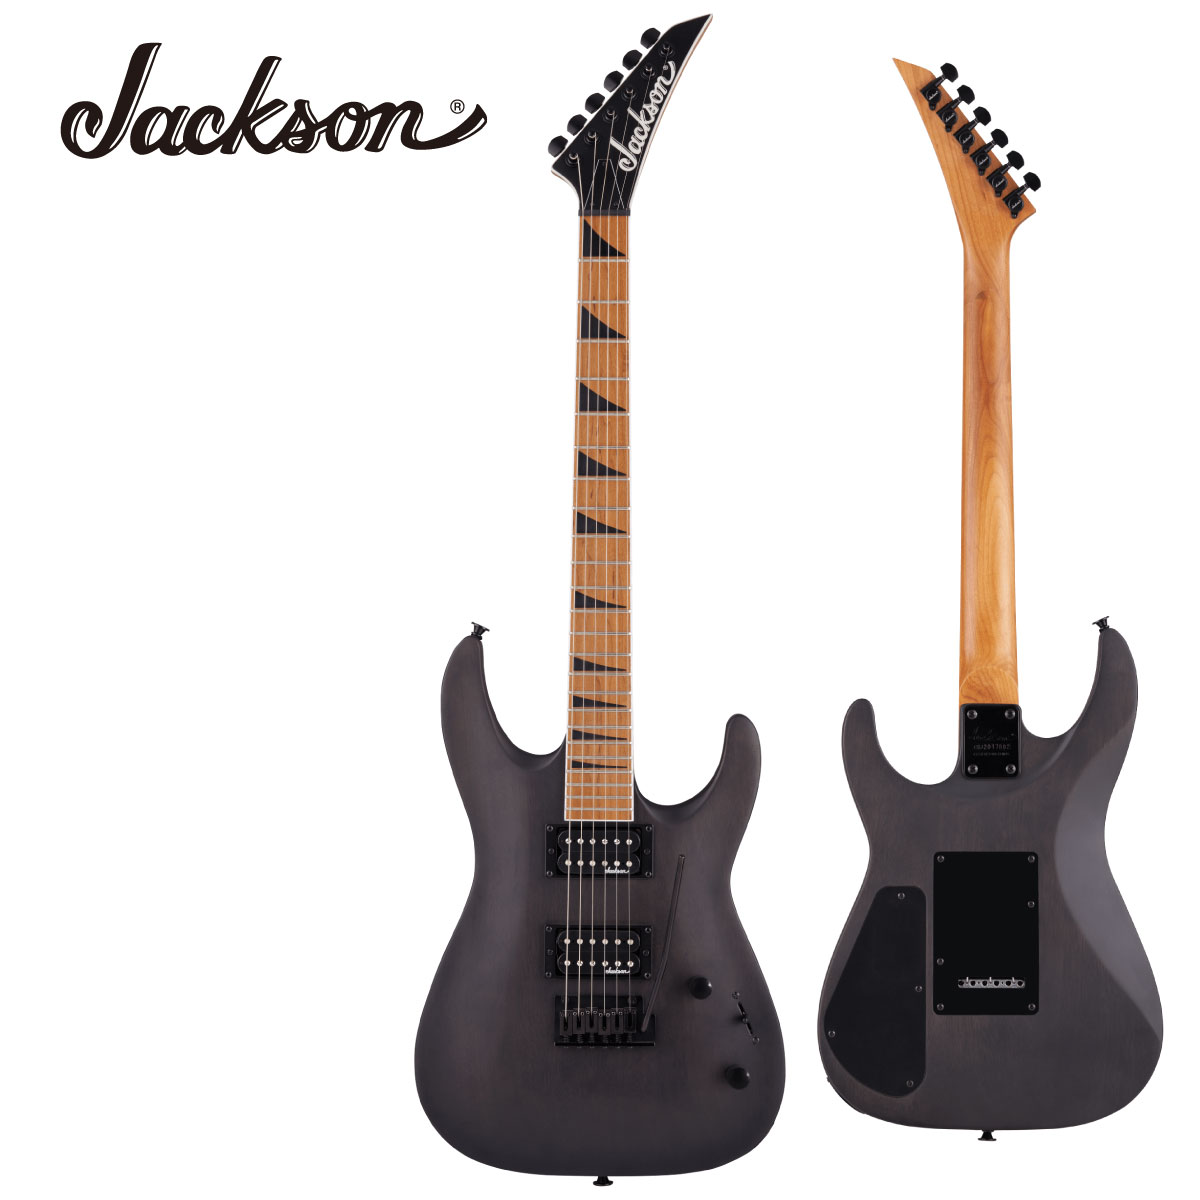 Jackson JS Series Dinky Arch Top 大注目 JS24 DKAM -Black ブラック 黒 ジャクソン Electric Stain- エレキギター Guitar 新品 安心と信頼